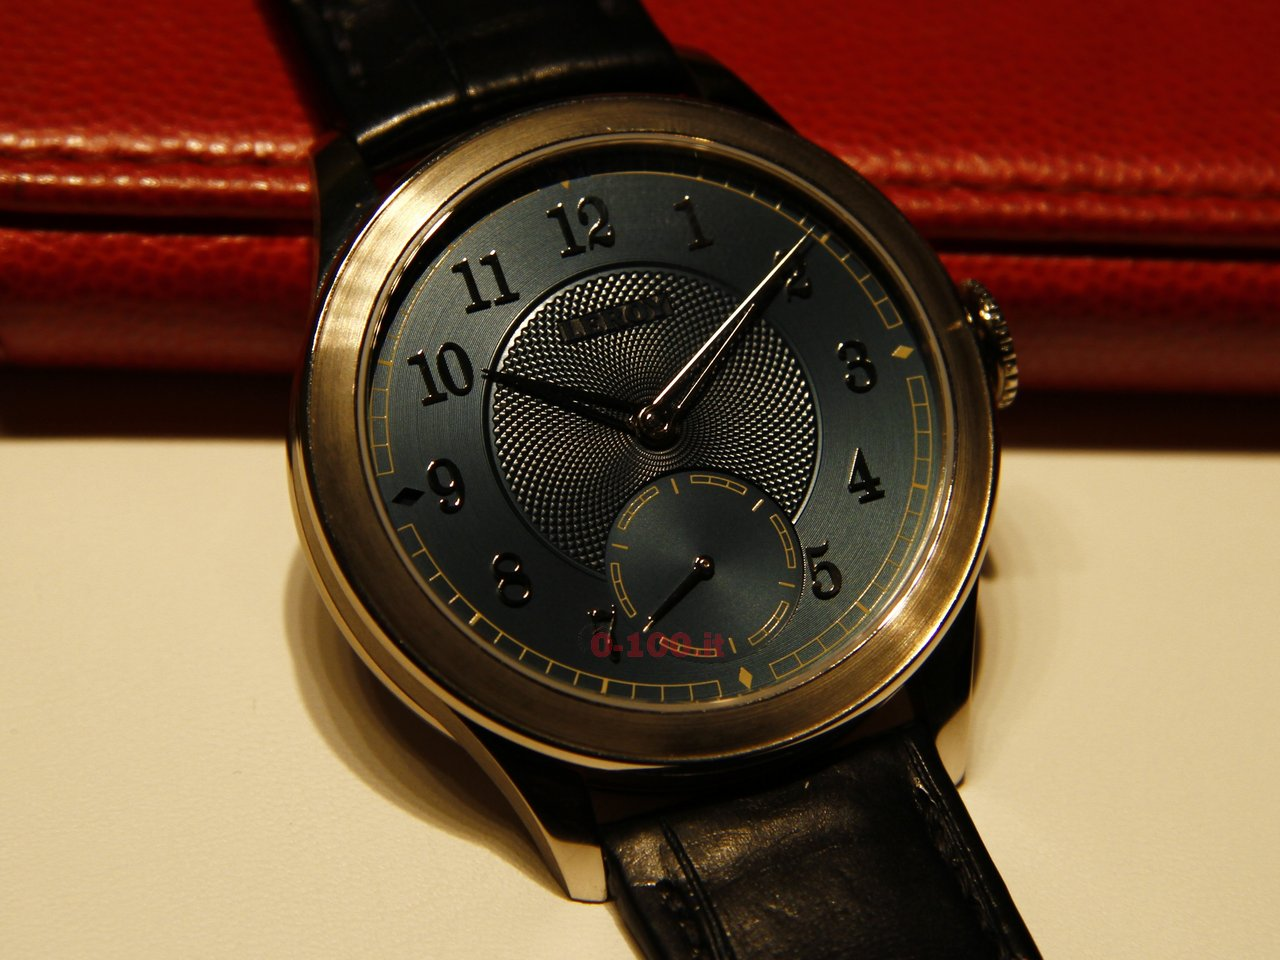 baselworld-2015_leroy-chronometer-l200-0-100-1